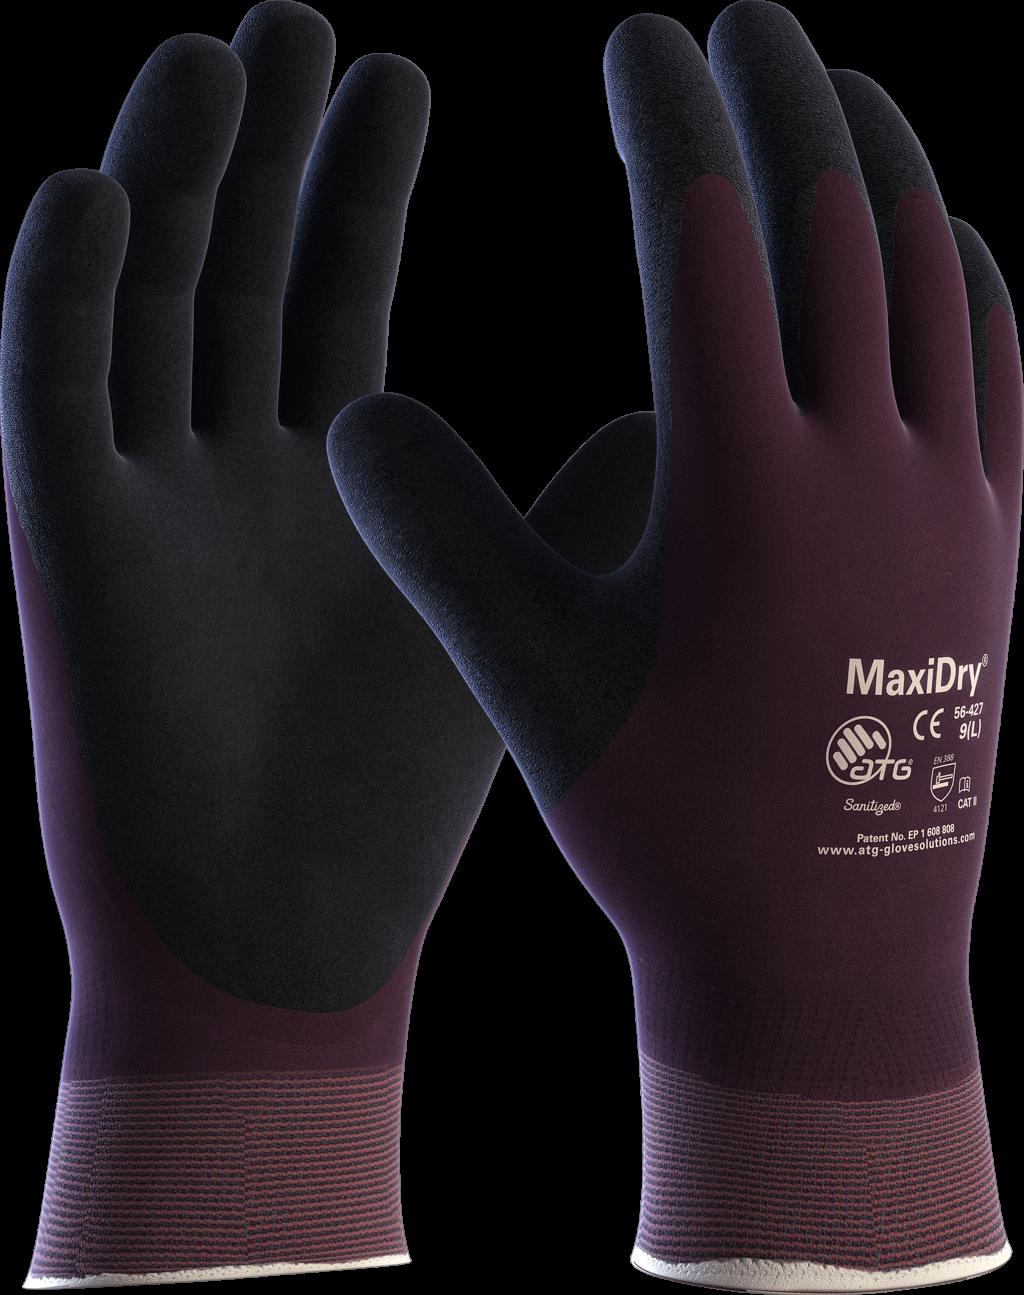 MaxiDry-56427-1024x1295.png